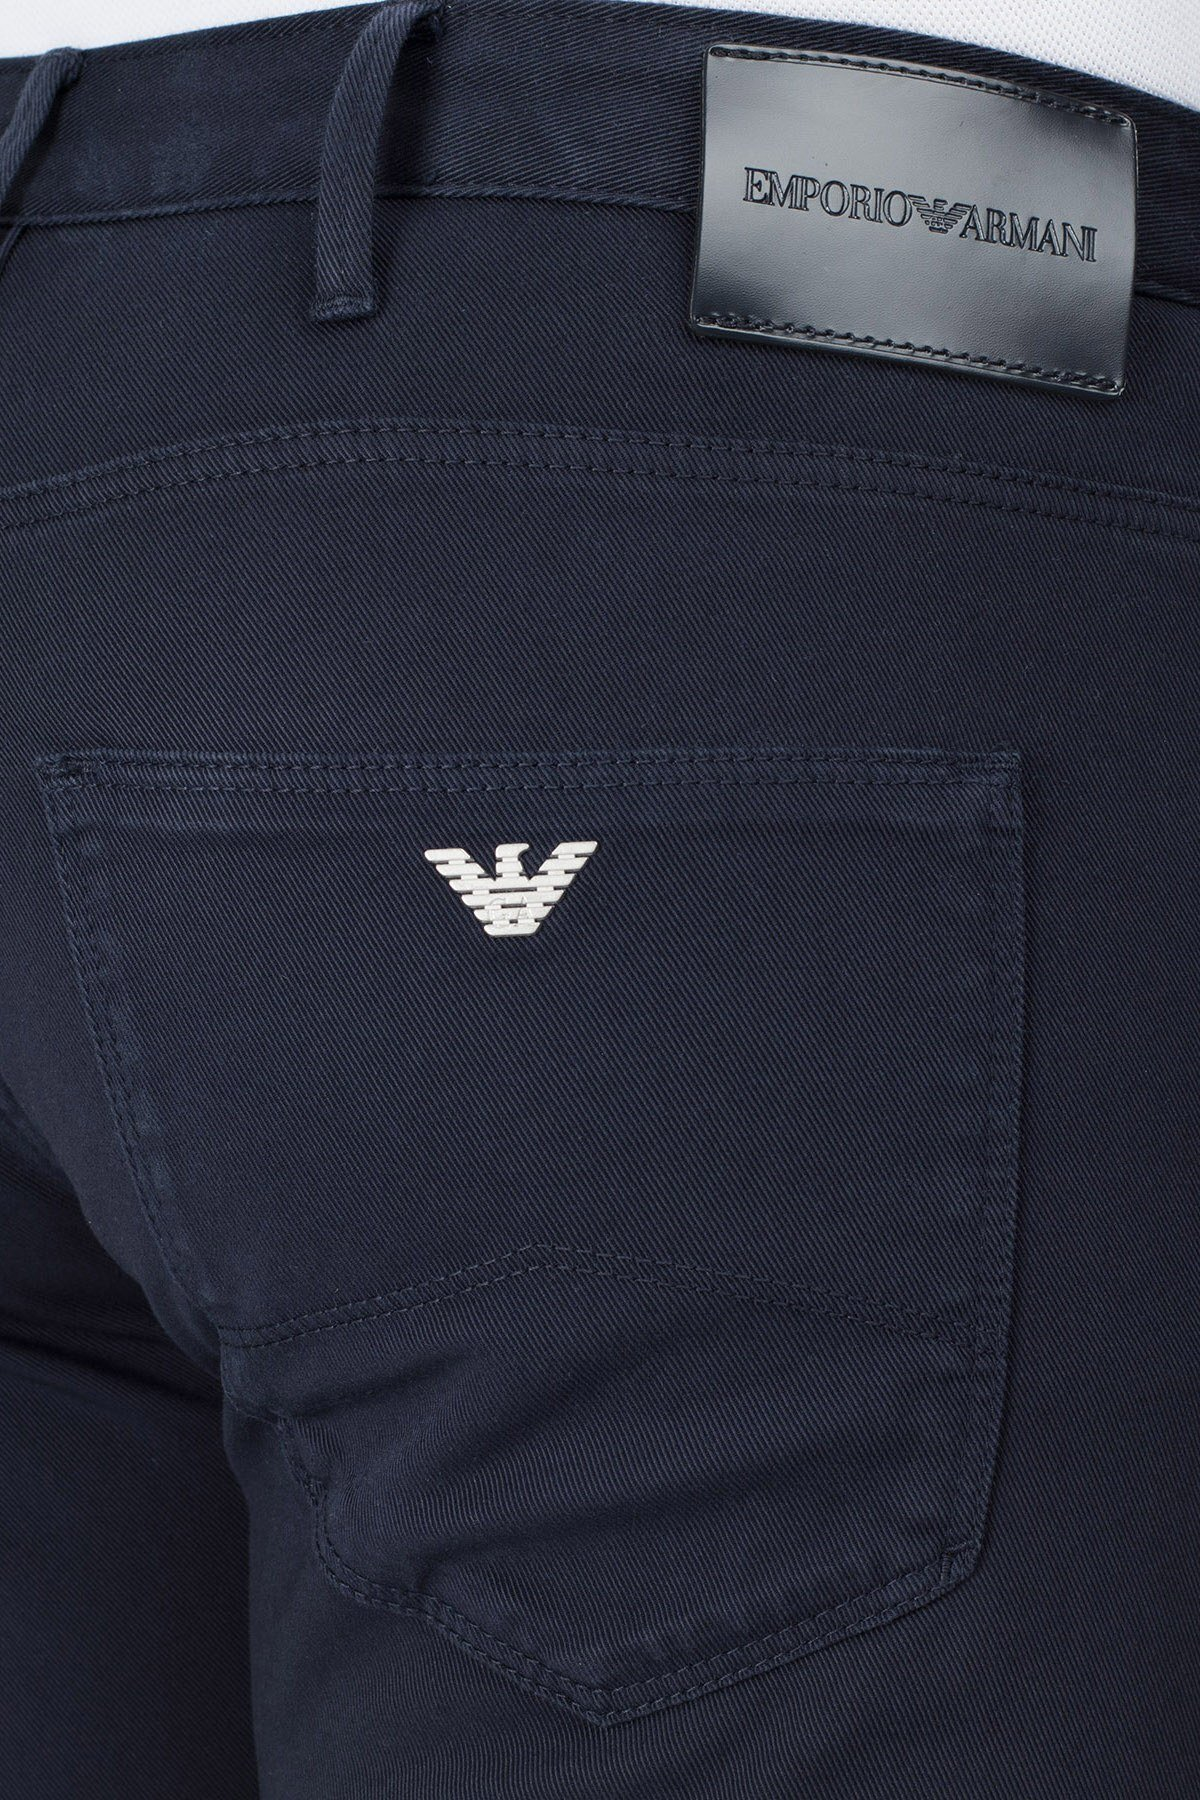 Emporio Armani J06 Jeans Erkek Pamuklu Pantolon 3H1J06 1N8XZ 0922 LACİVERT